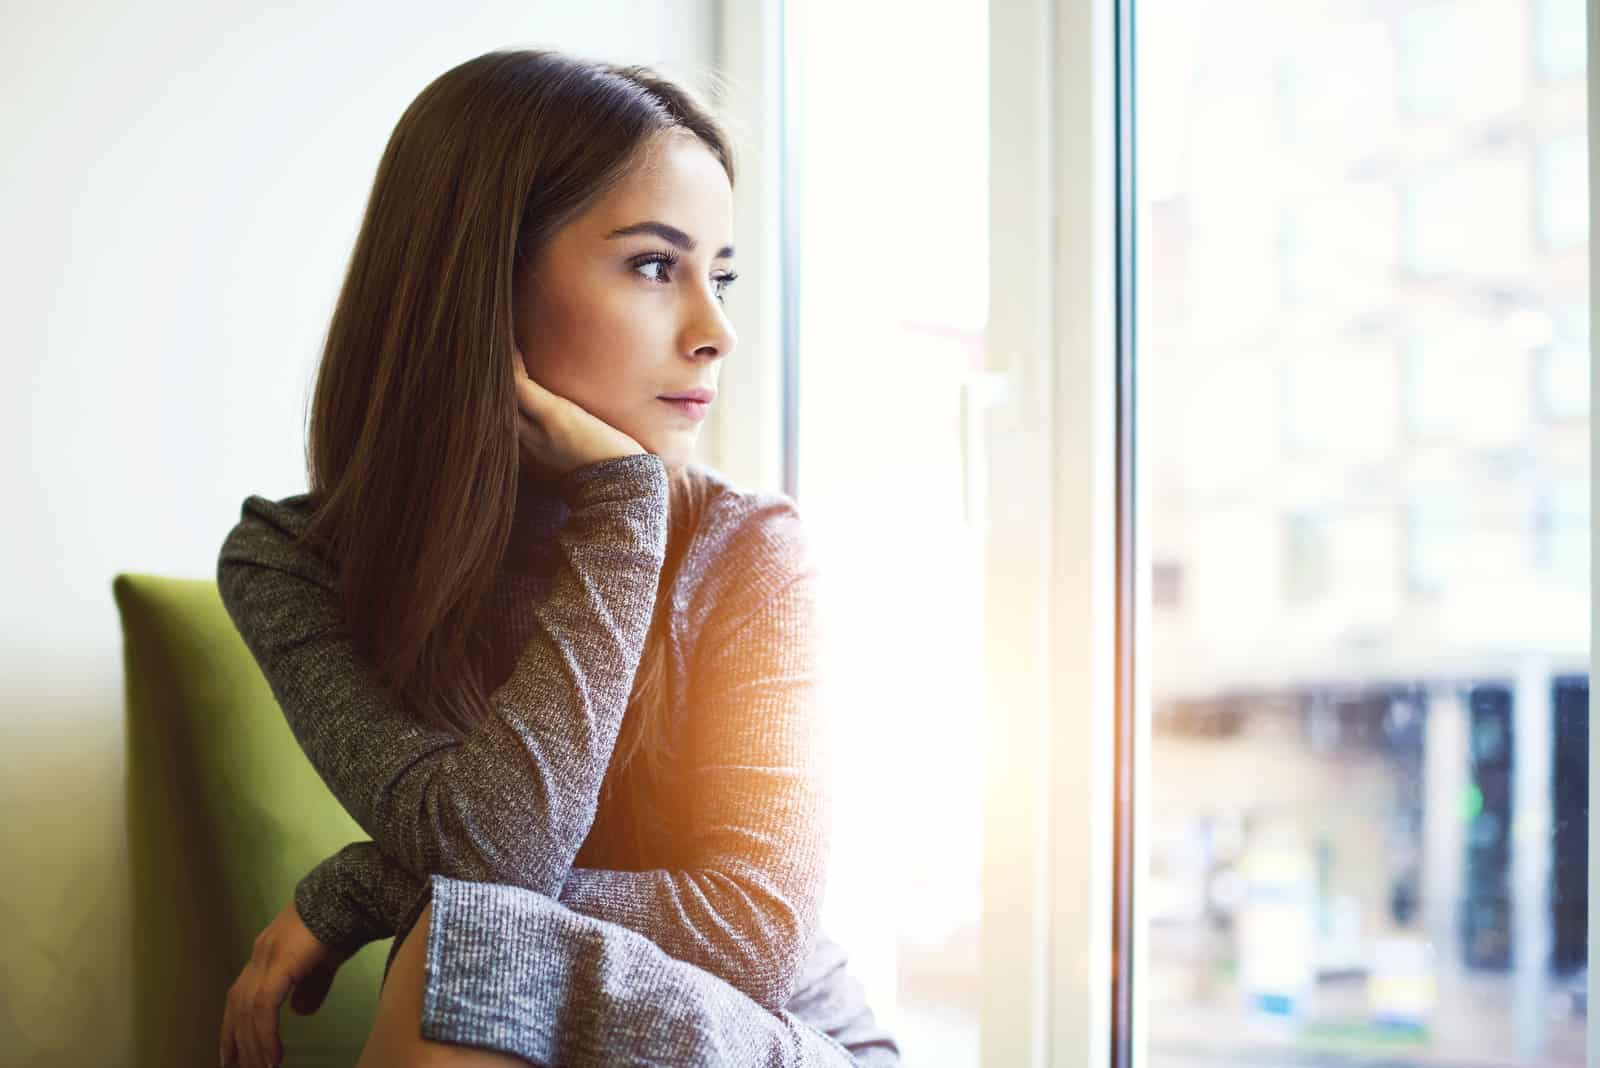 Femme attirante consciente regardant par la fenêtre